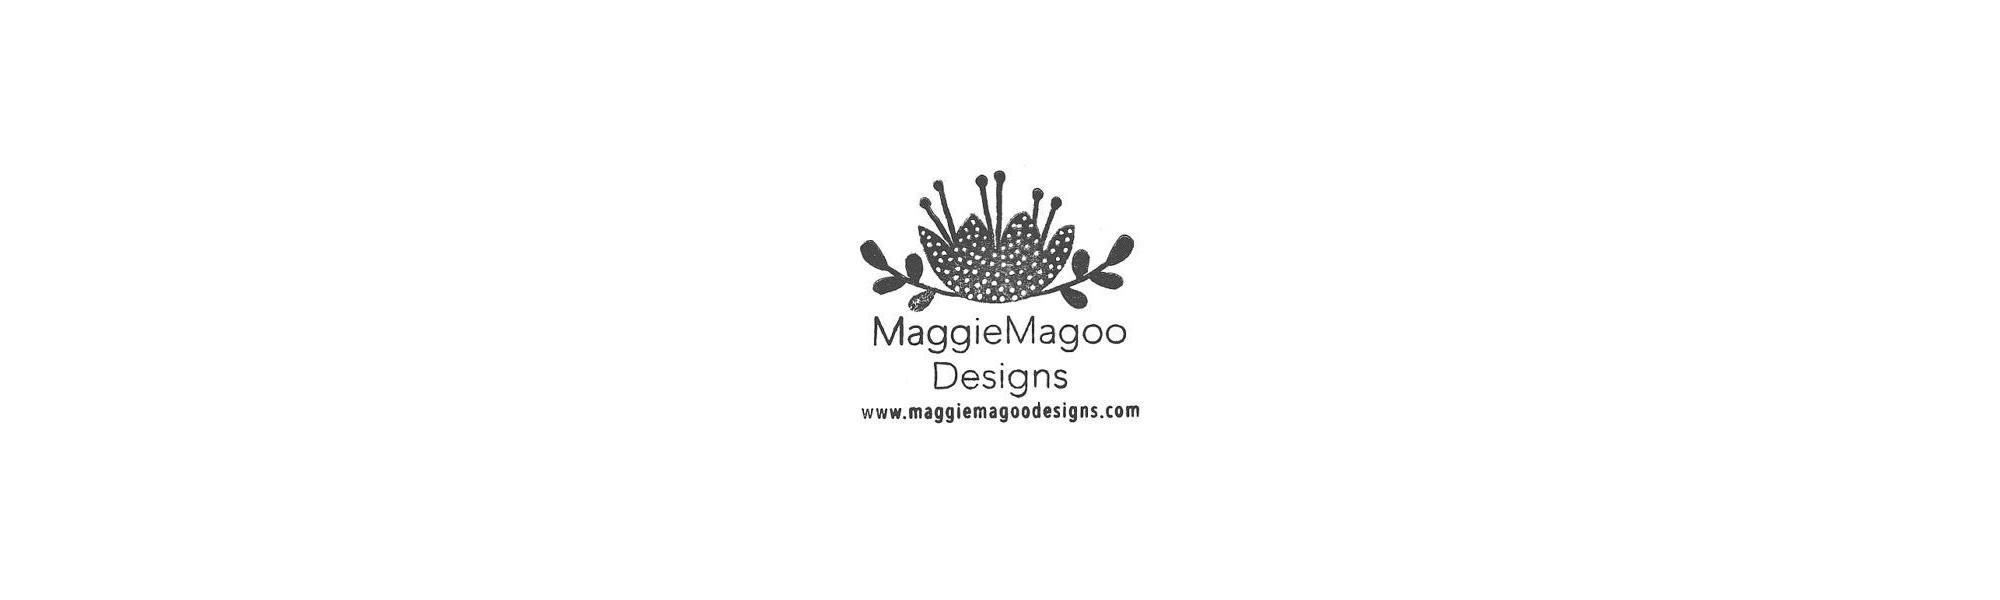 Maggie Magoo Designs